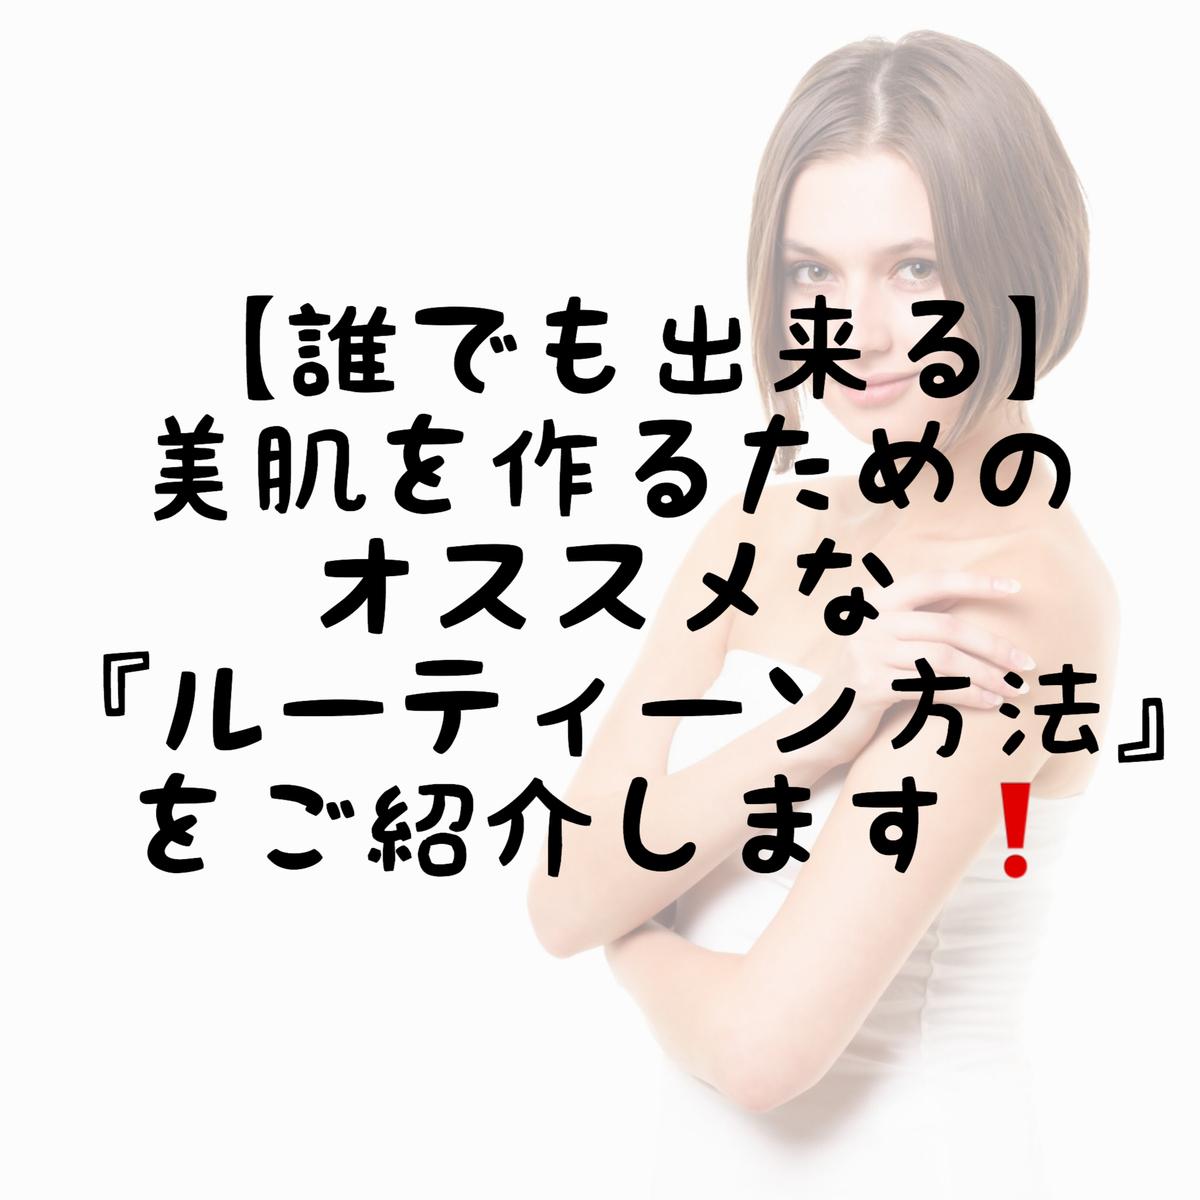 f:id:nokonoko_o:20200617210237j:plain